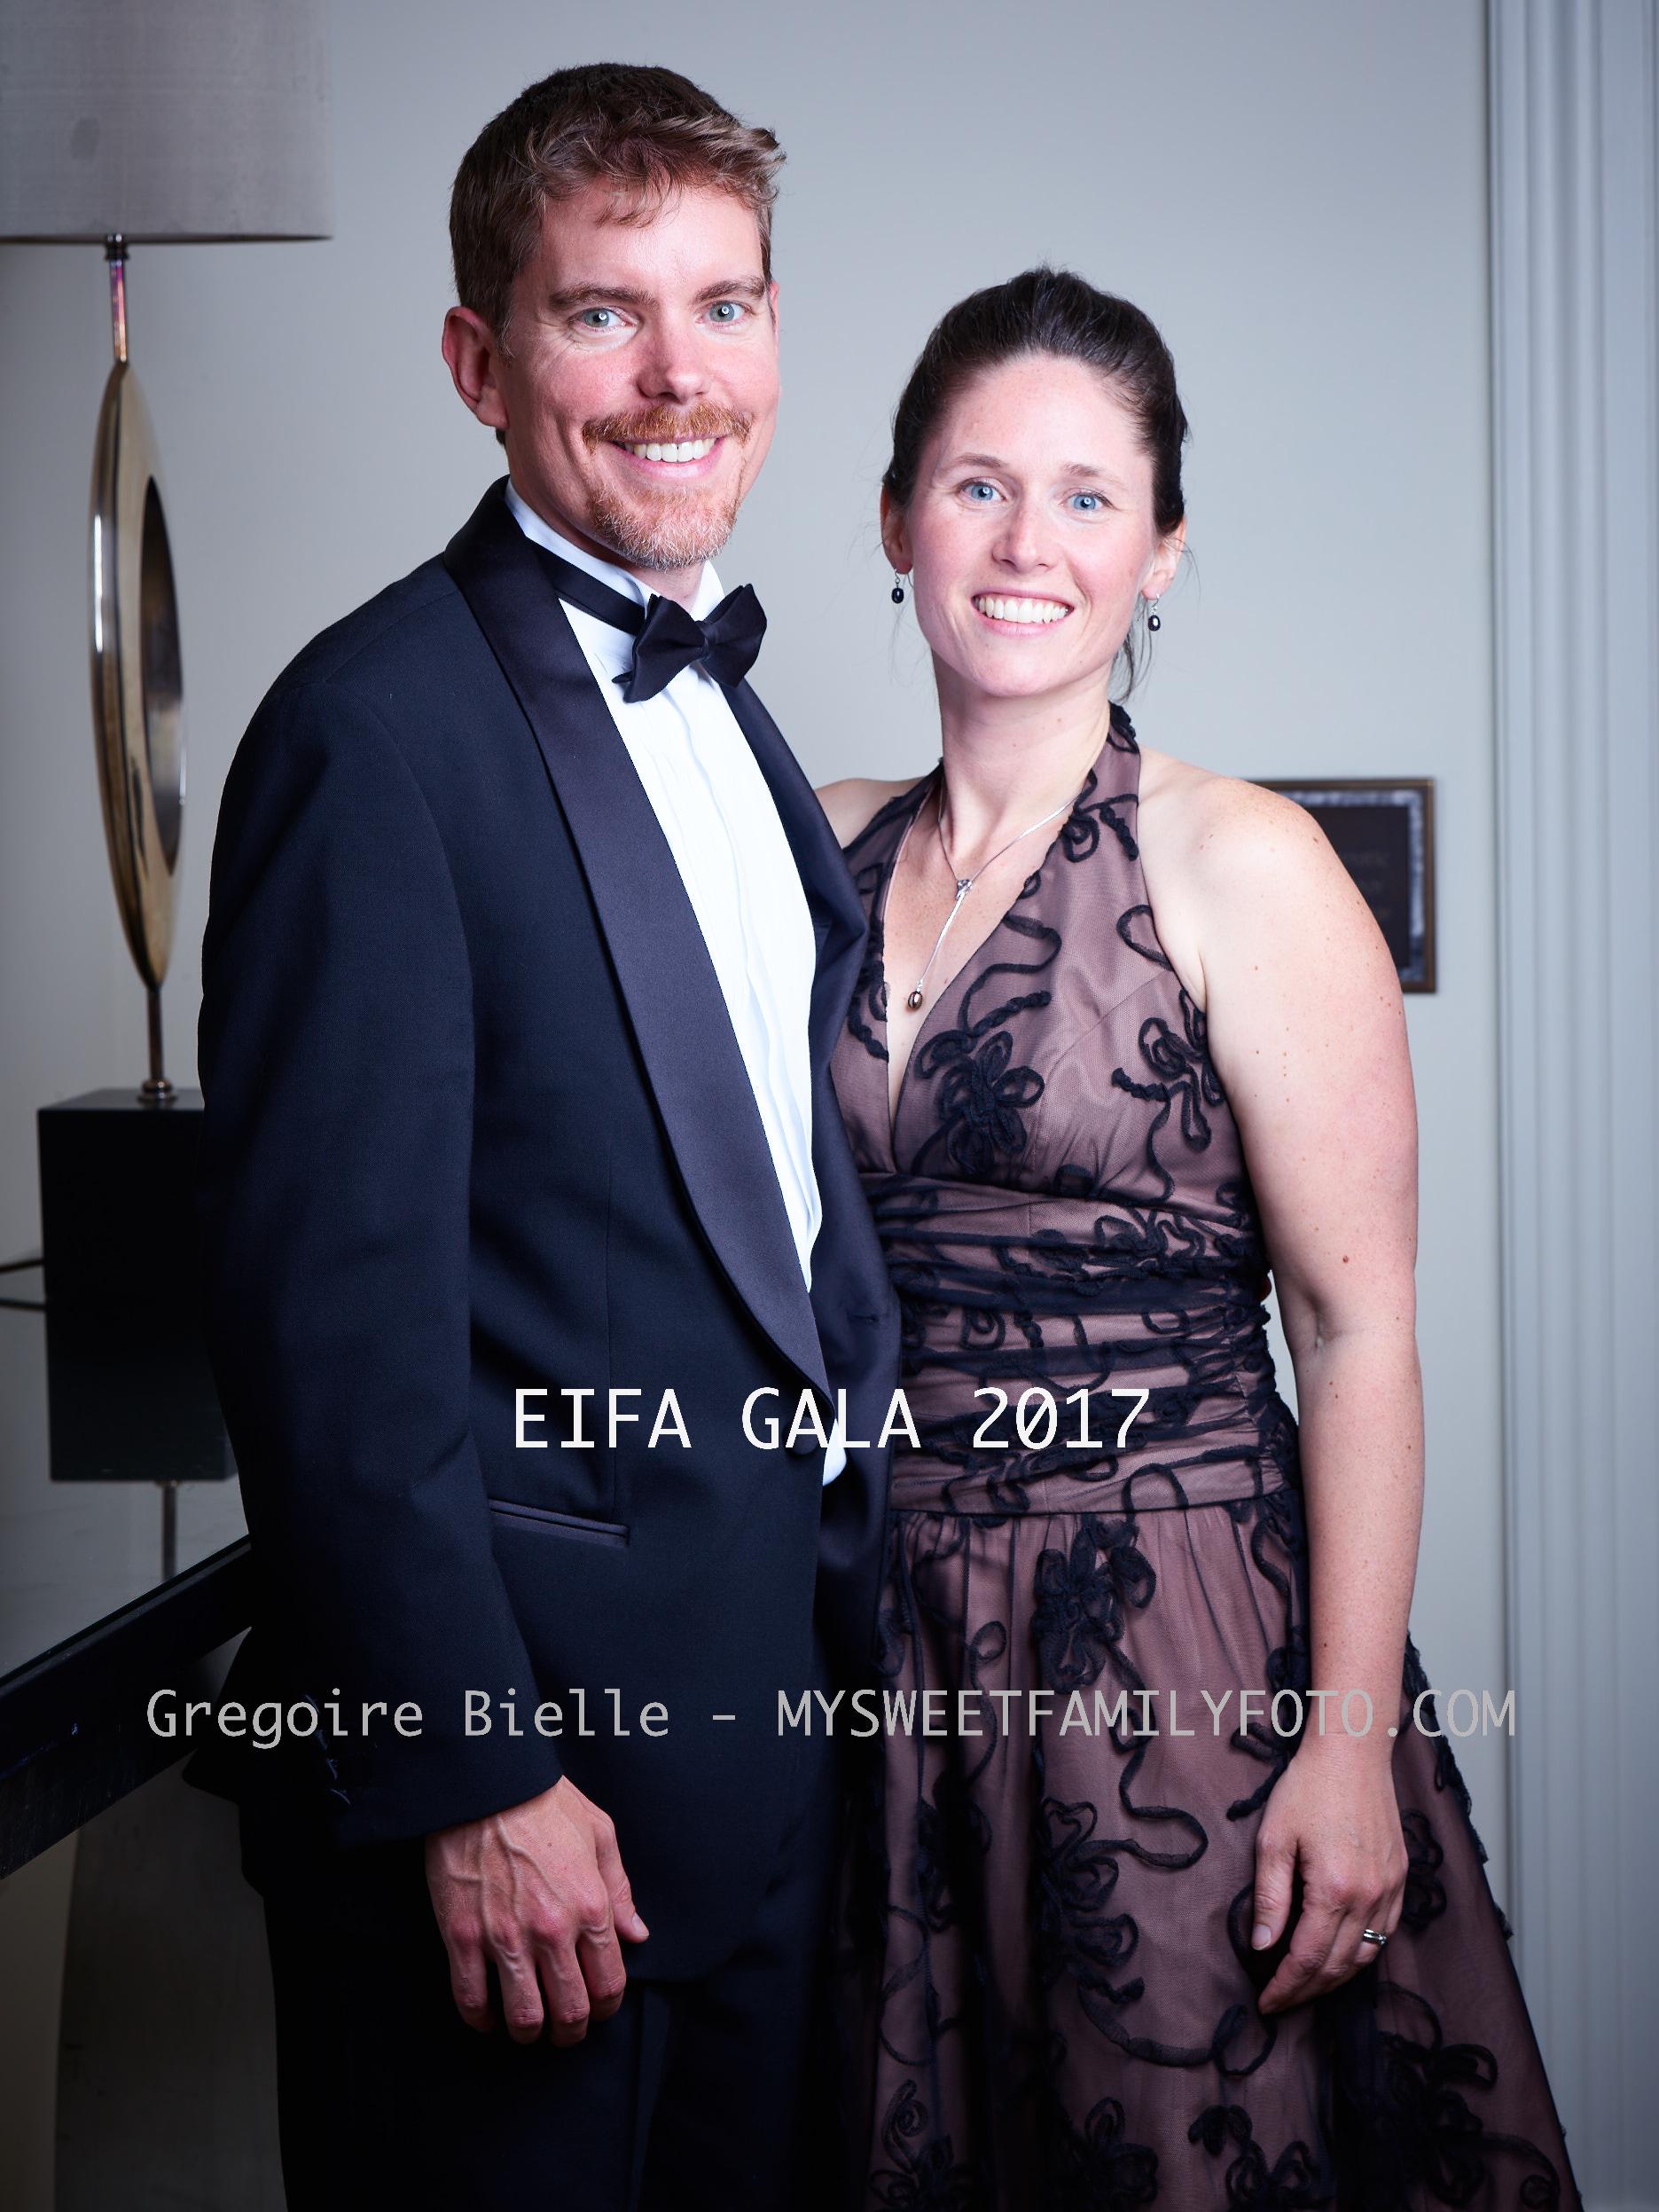 EIFA GALA 1197.jpg